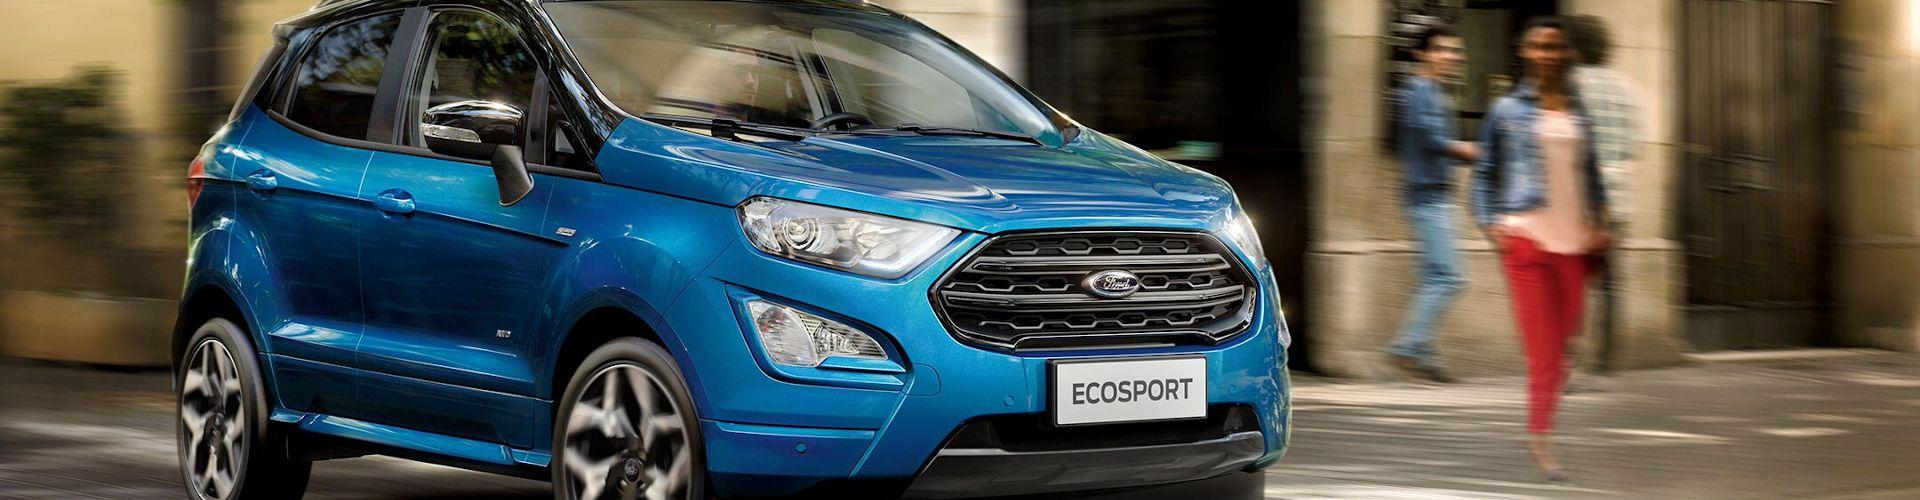 Ford Ecosport ST Line - Α. Λιάπης Αντιπροσωπεία